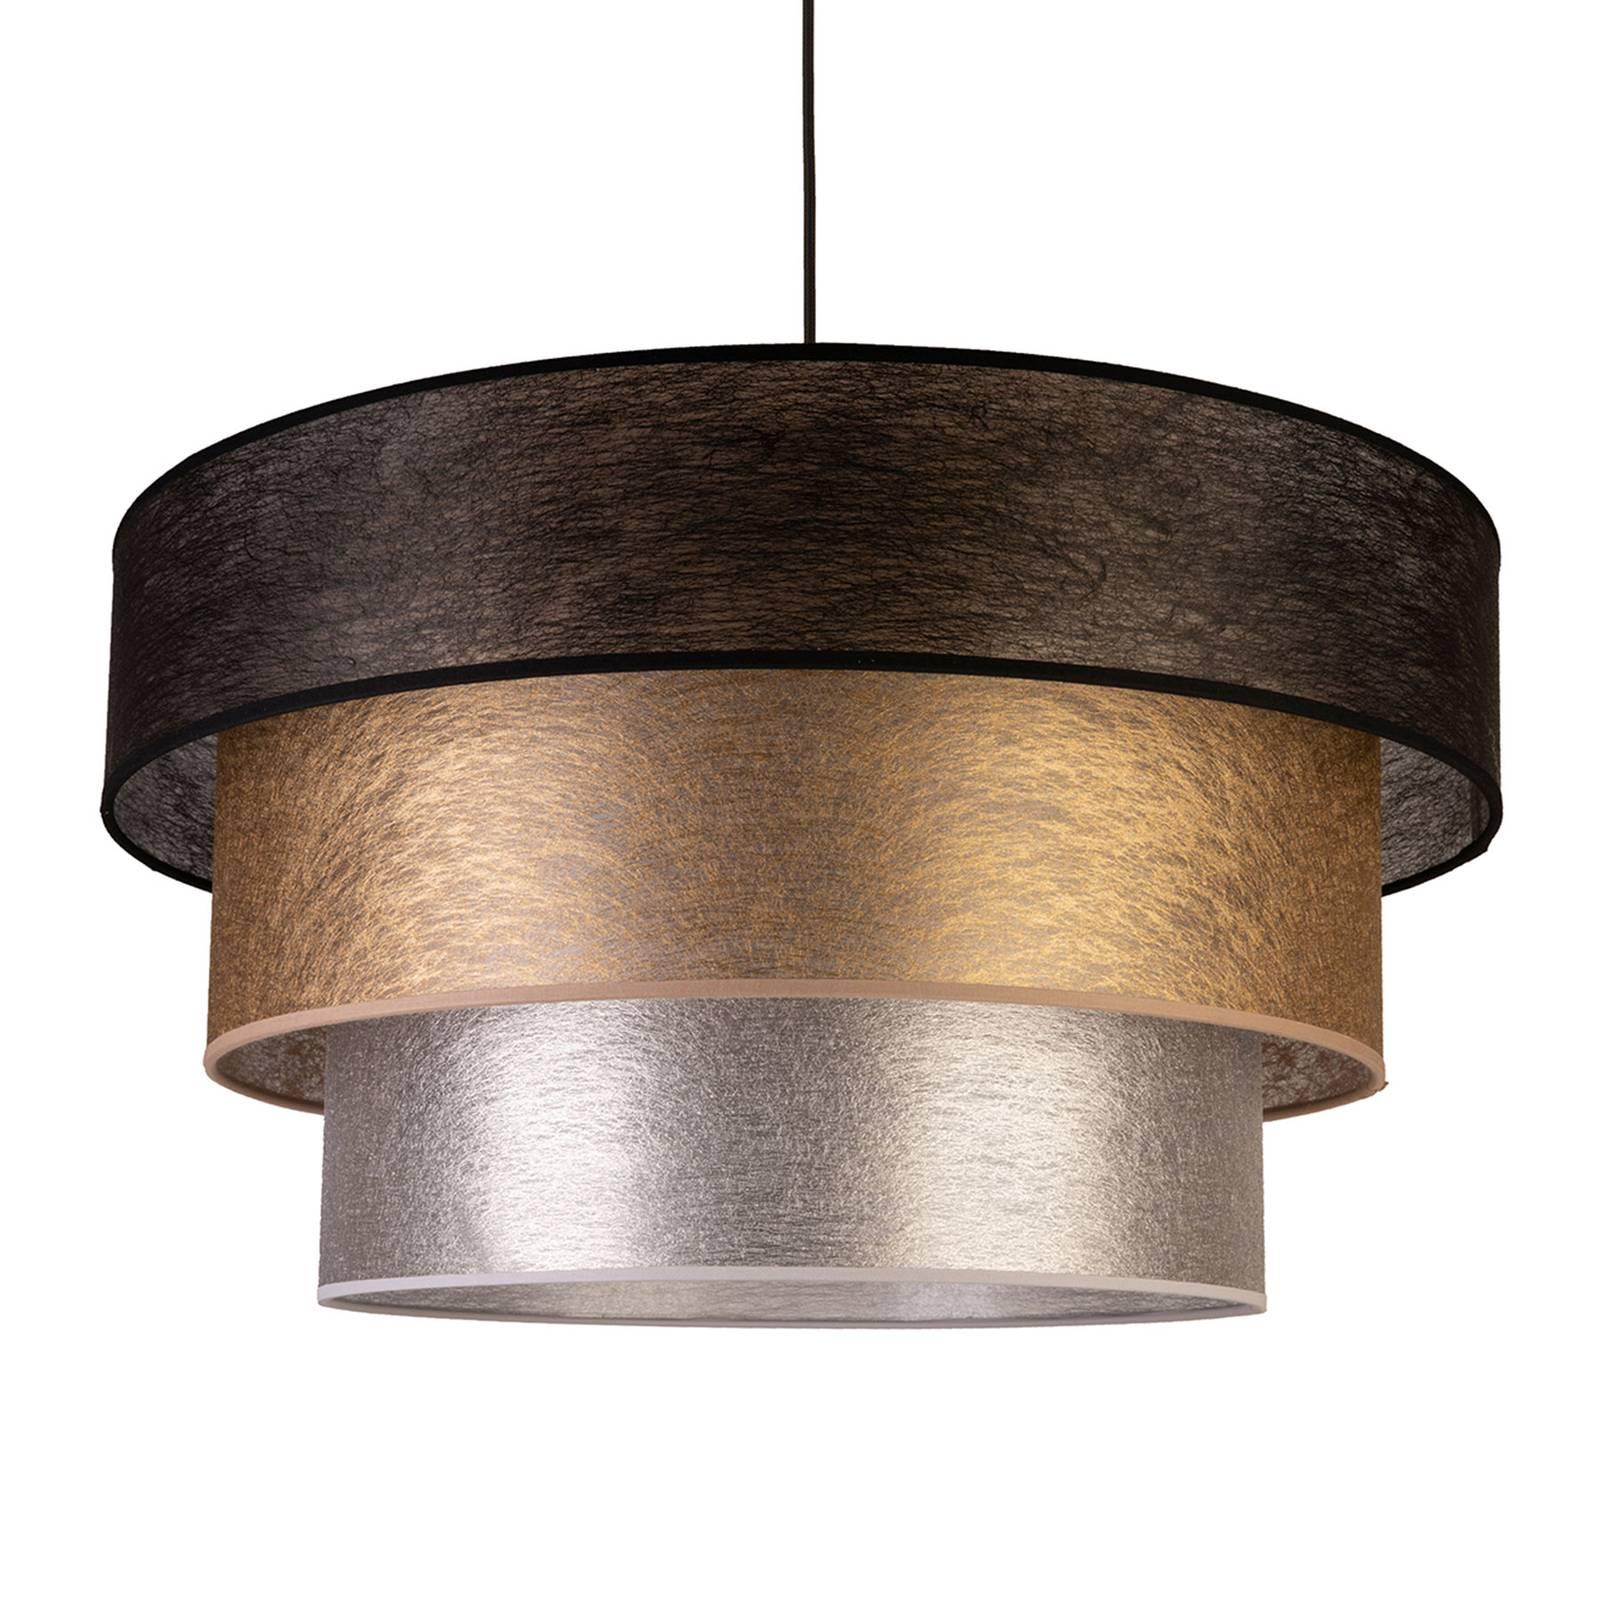 Textiel-hanglamp Luneta, zwart/goud/grijs